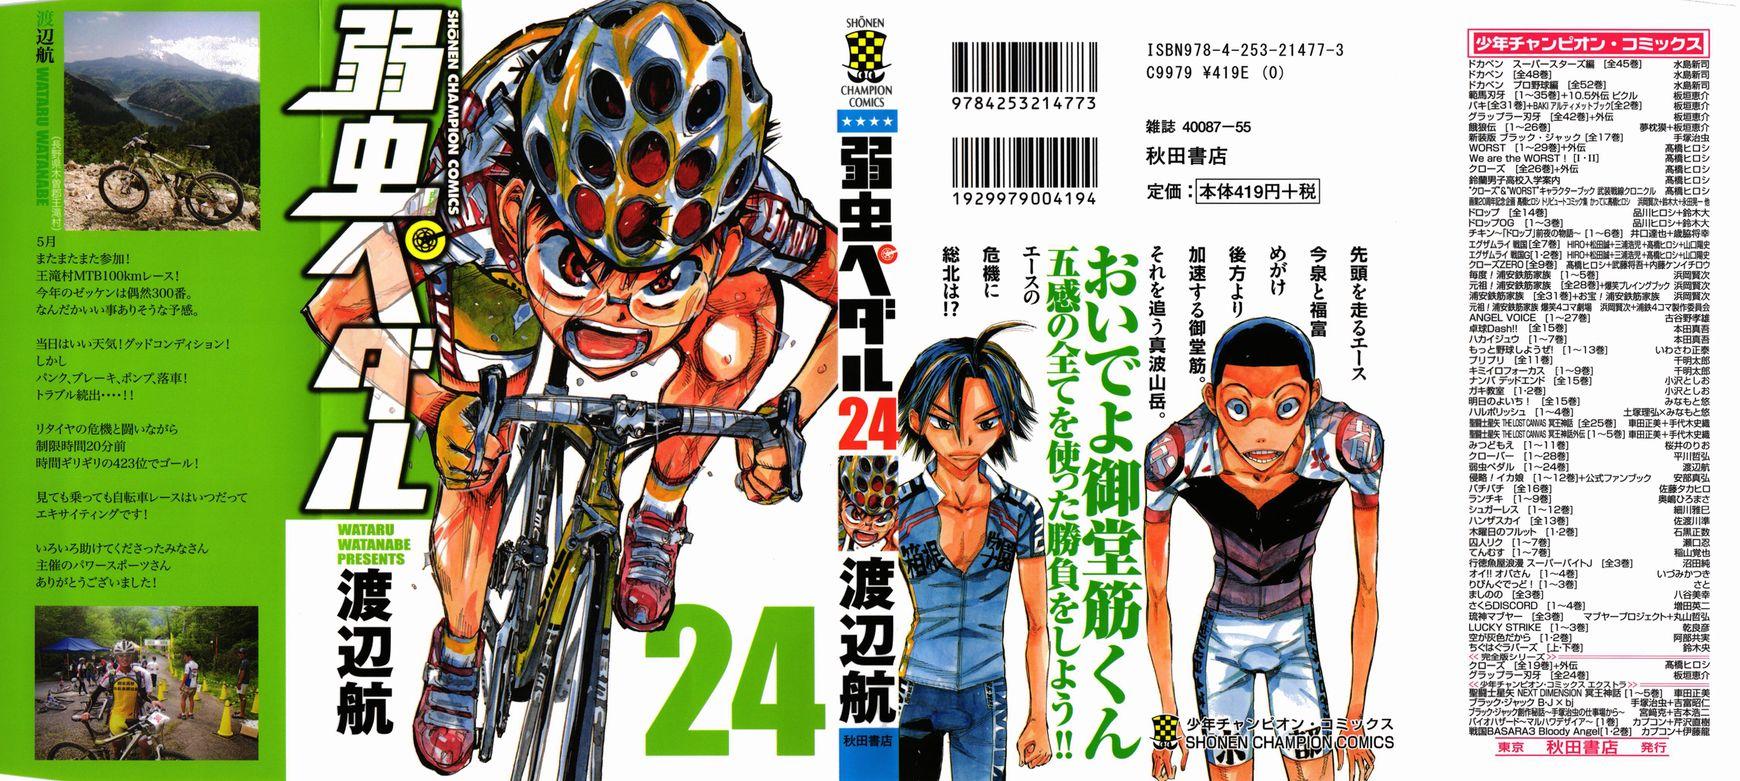 Yowamushi Pedal 200 Page 1